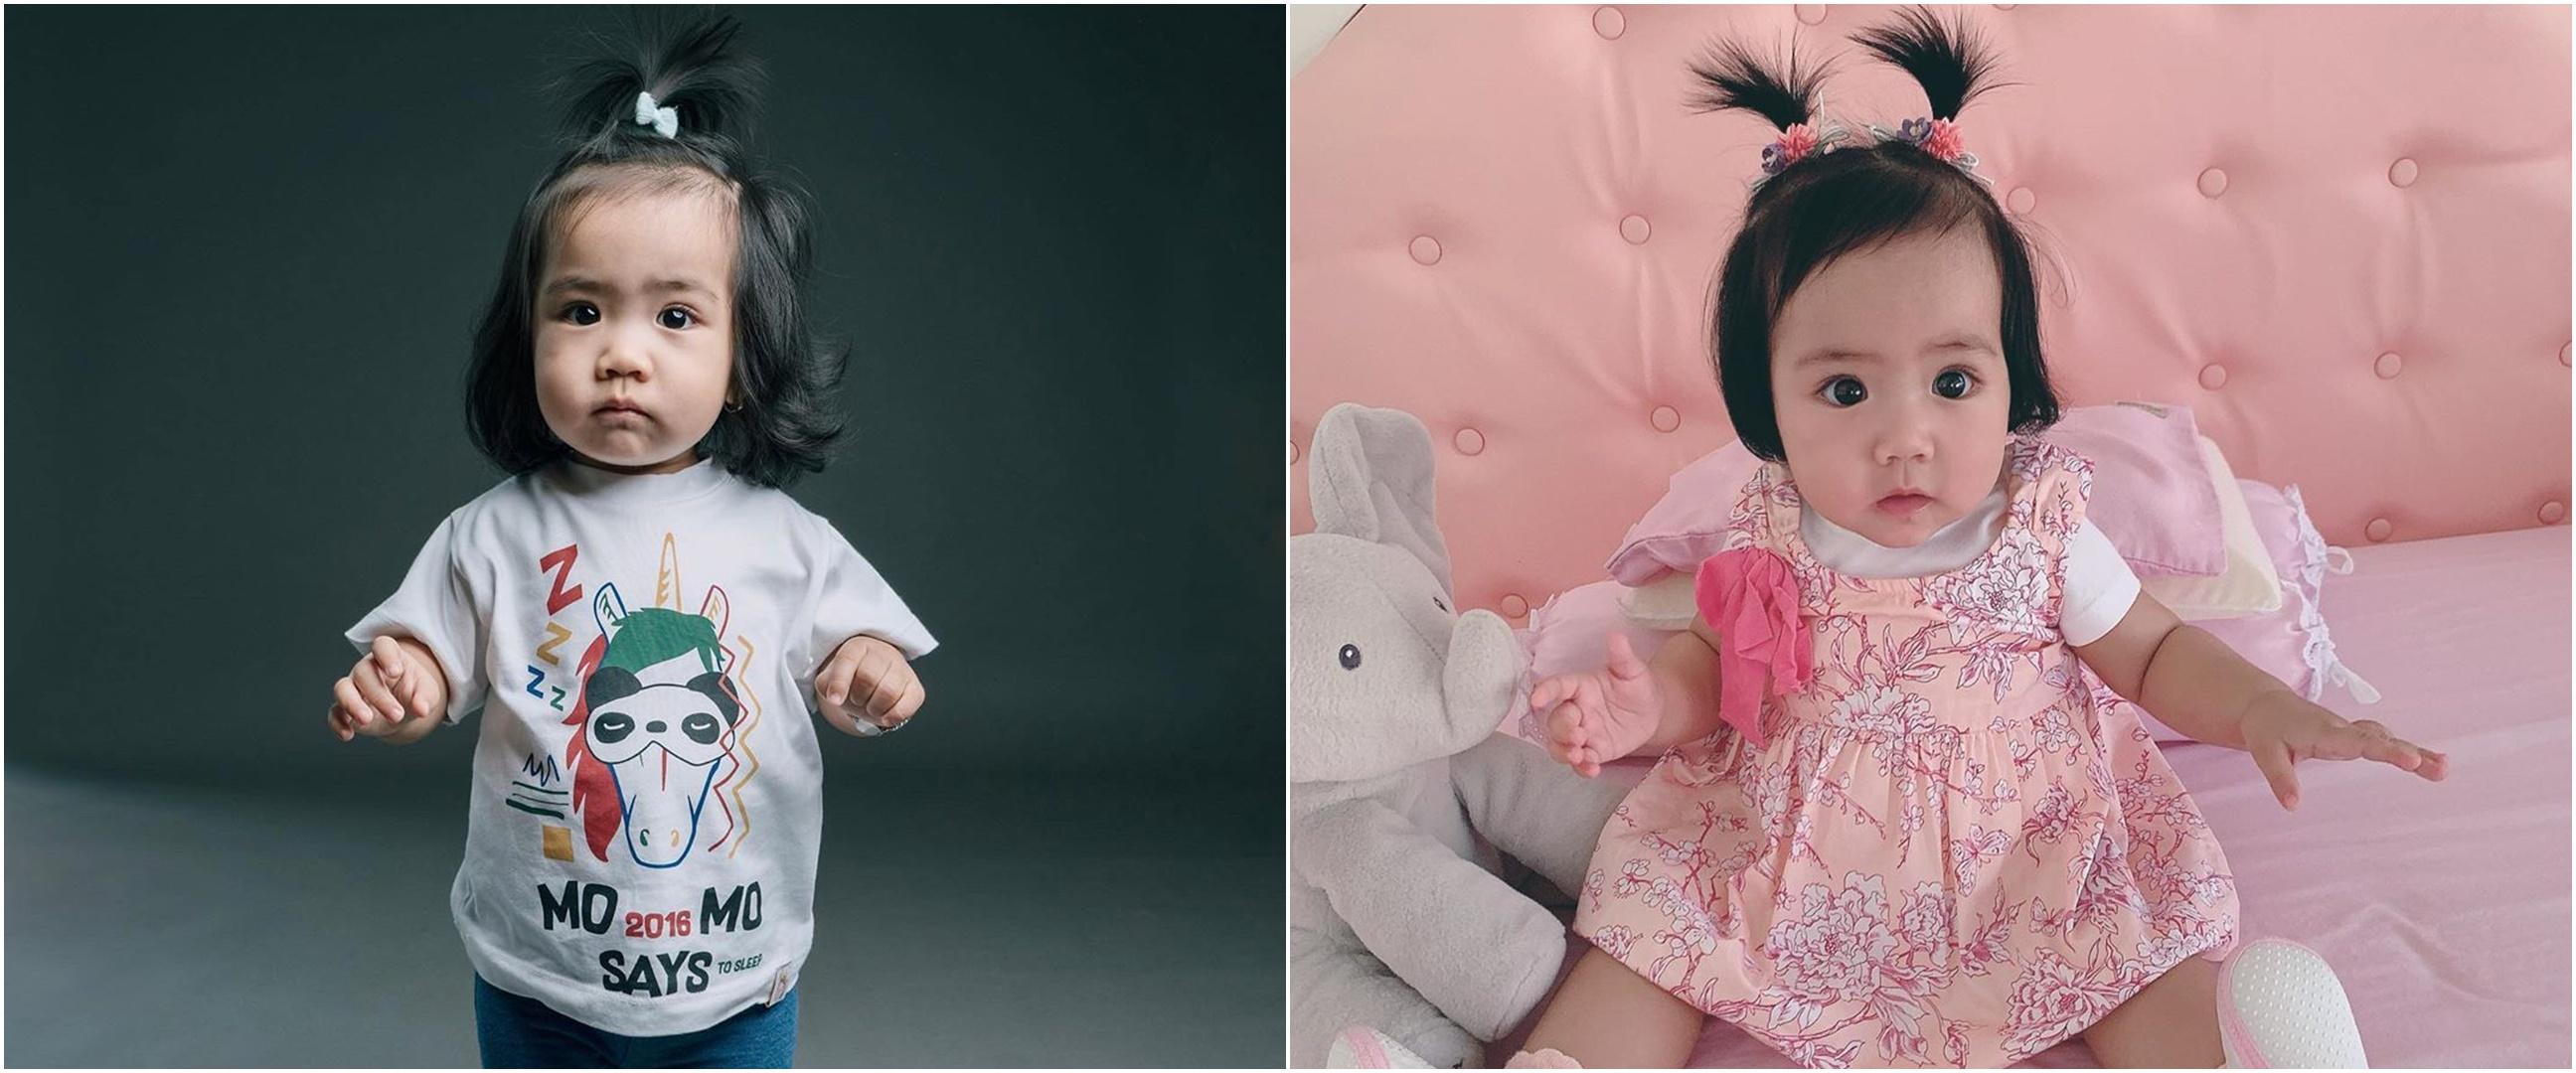 7 Potret menggemaskan anak Momo Geisha dengan rambut kuncir air mancur